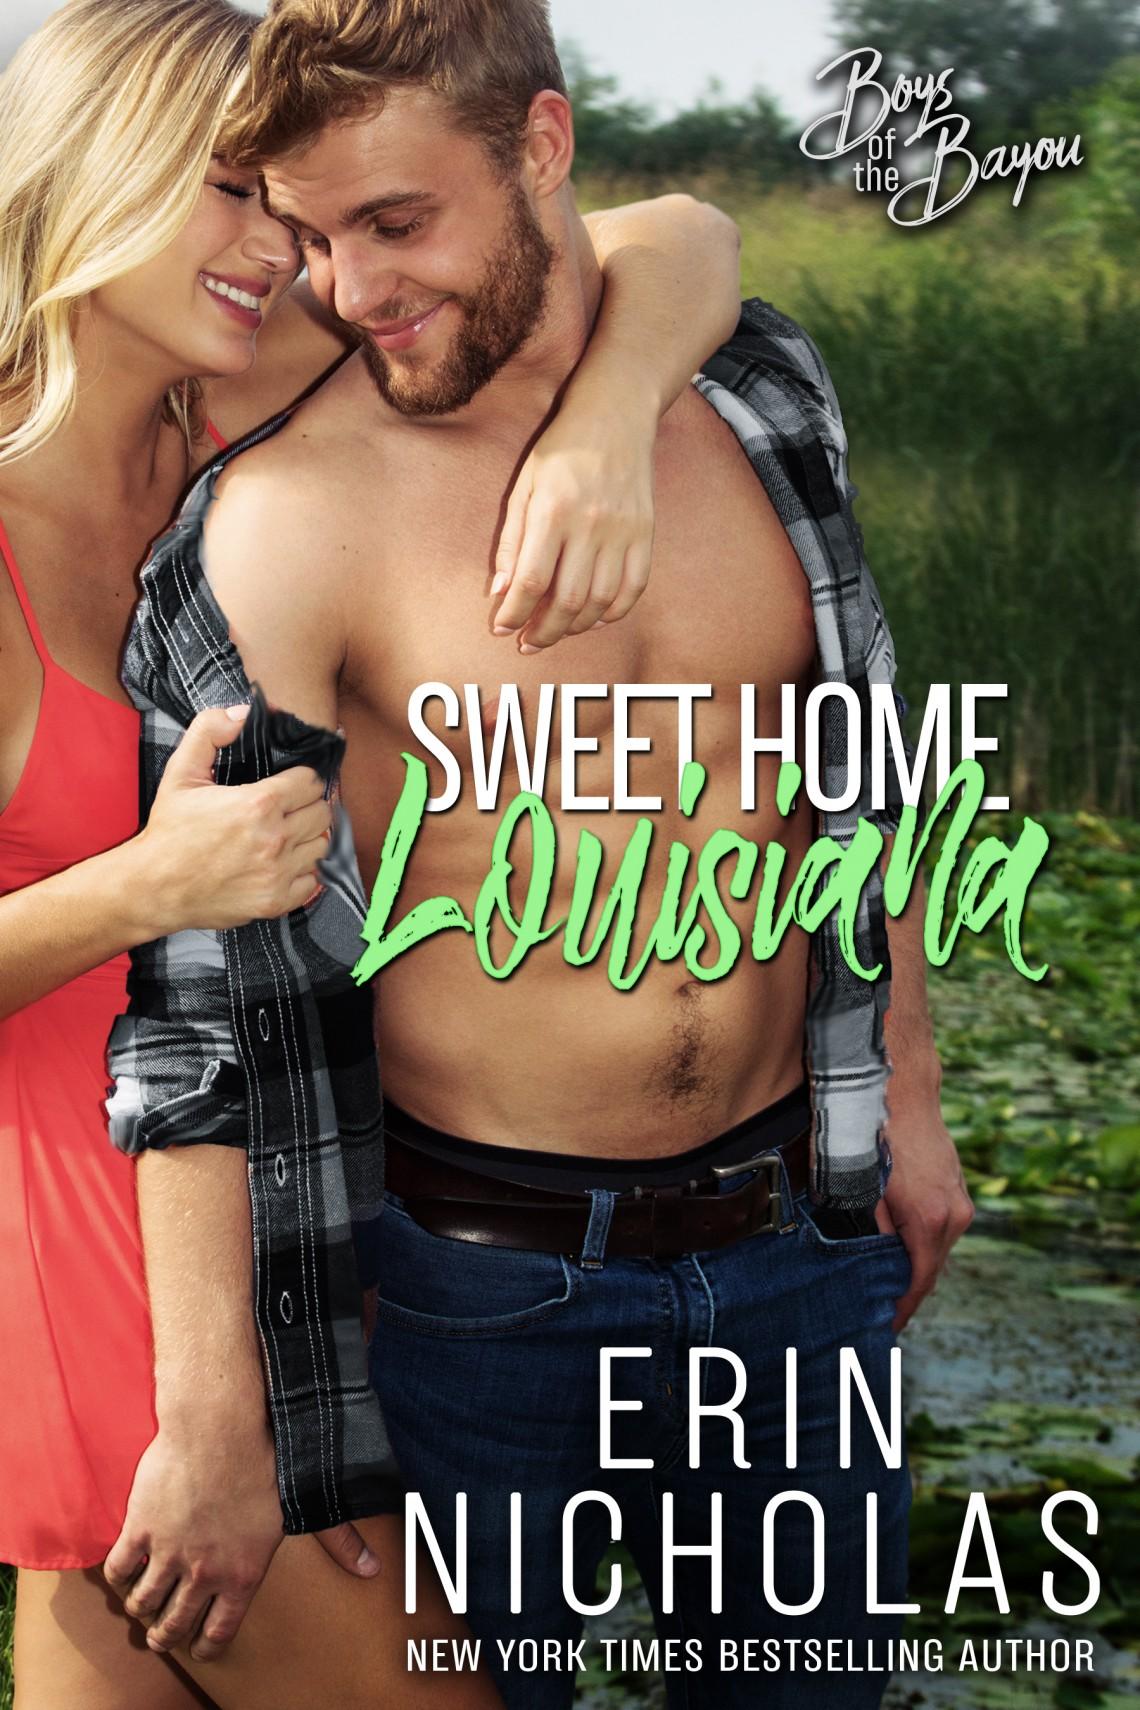 Sweet Home Lousiana by Erin Nicholas